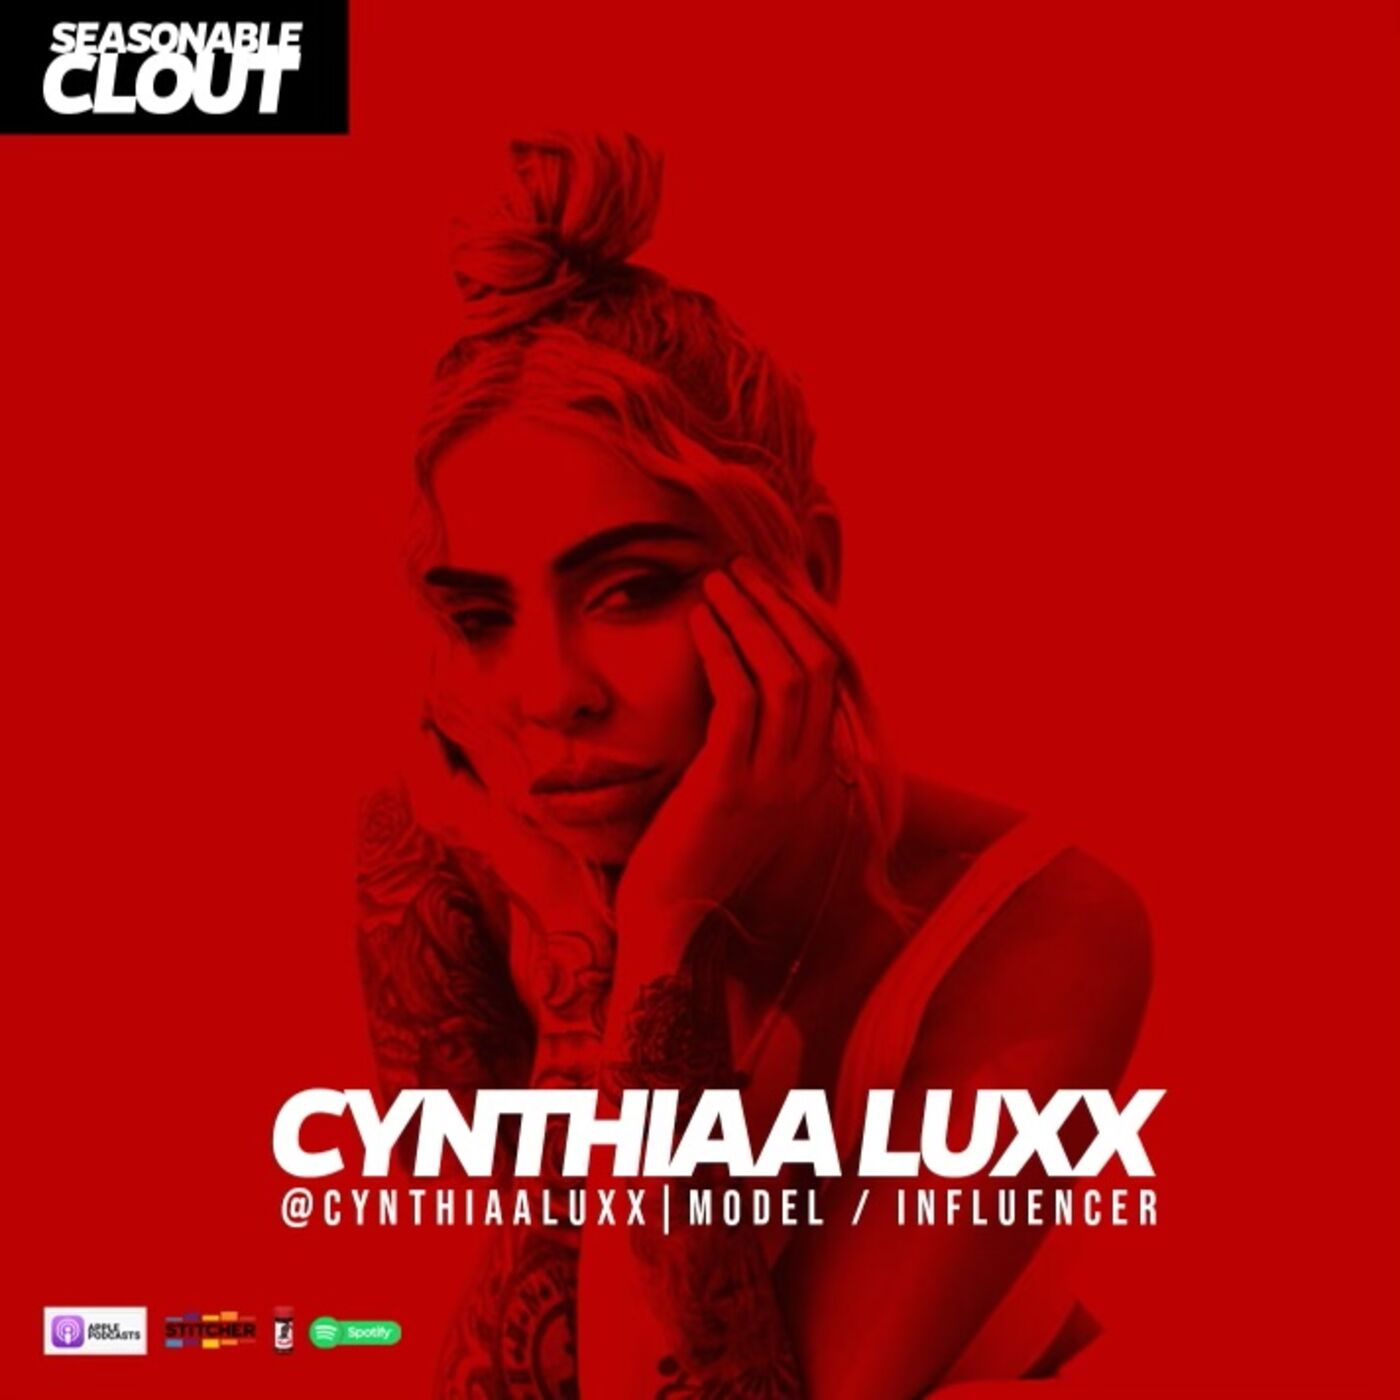 Luxx cynthia Seasonable Clout